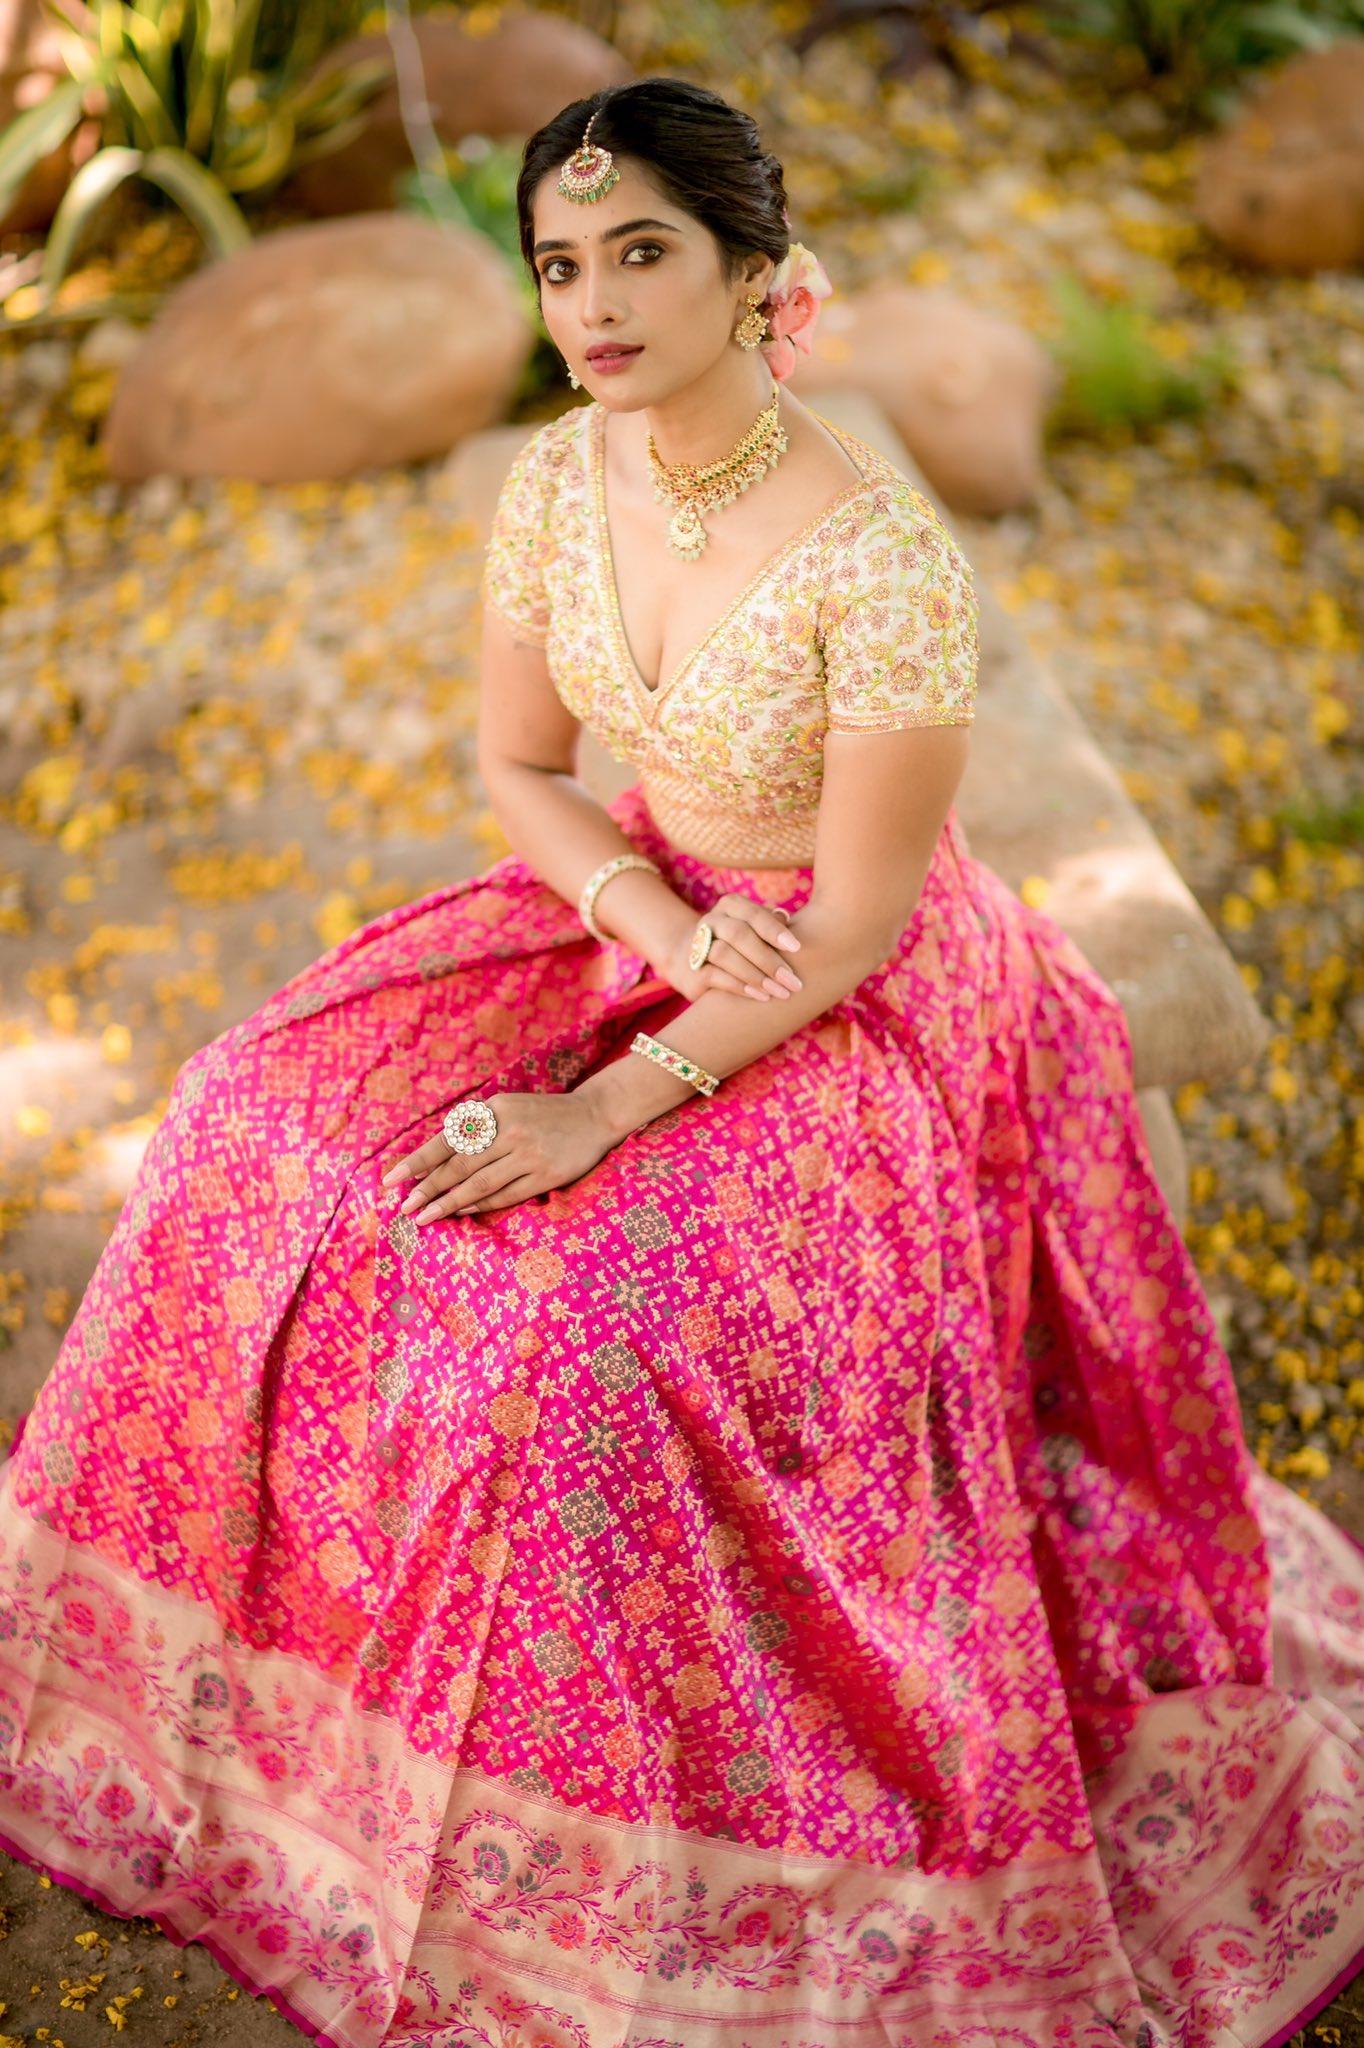 Masoom Shankar Photos hd (40)